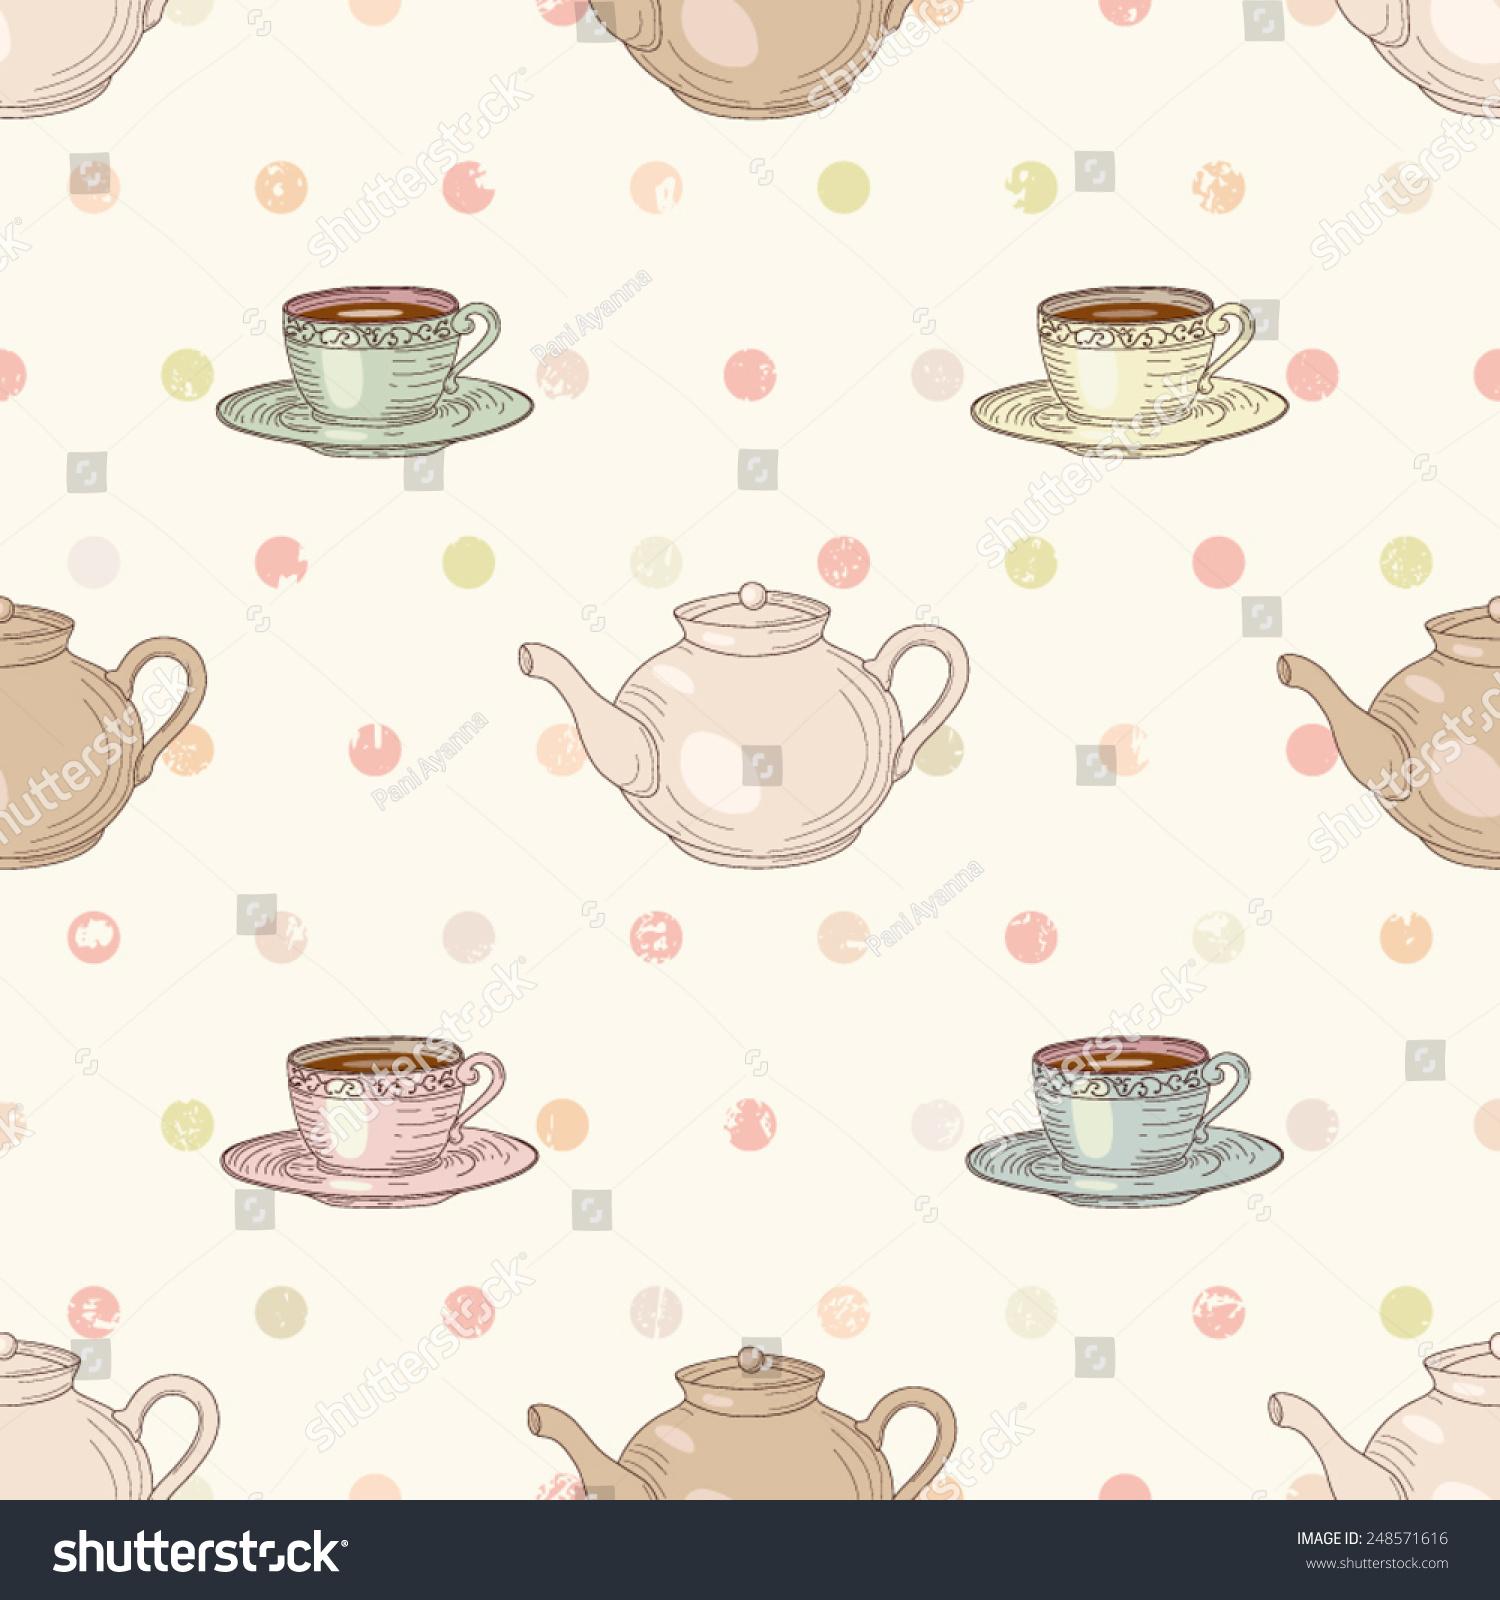 vintage tea cup wallpaper - photo #32